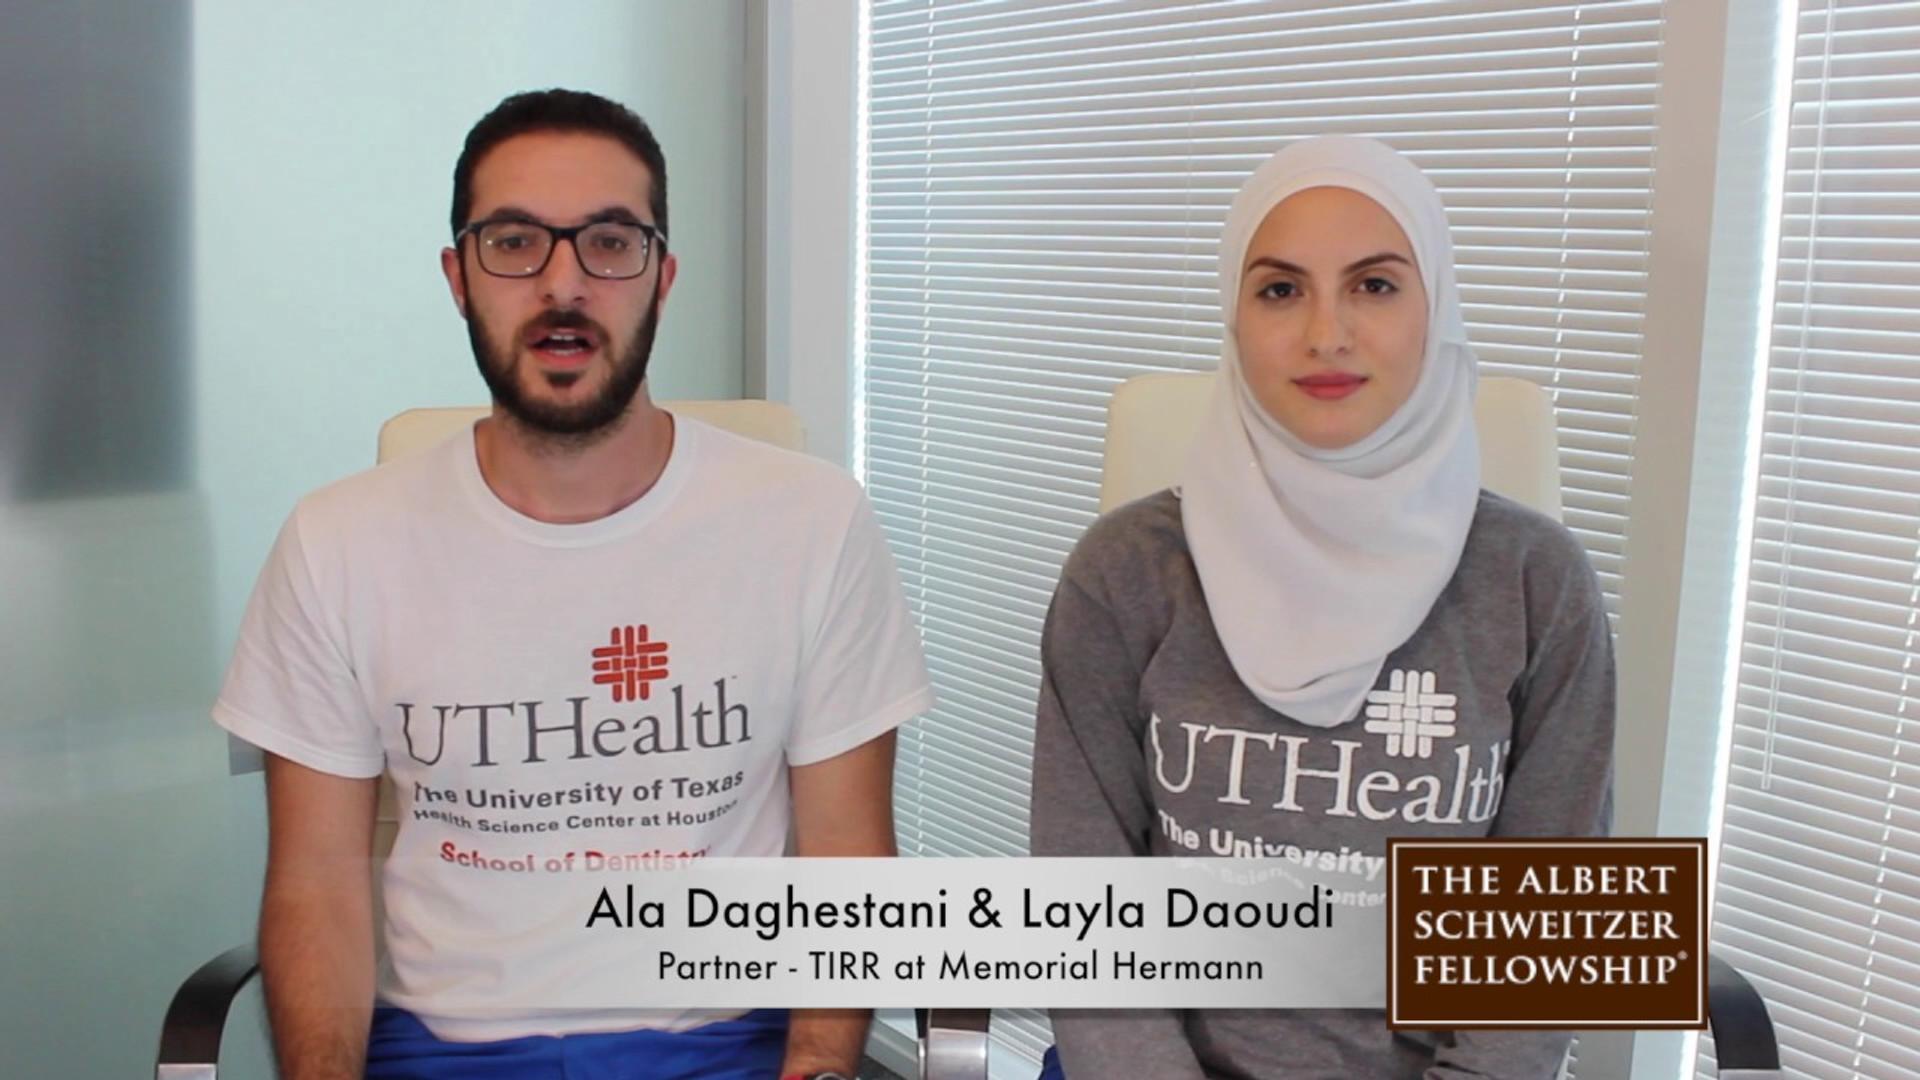 Ala Daghestani & Layla Daoudi